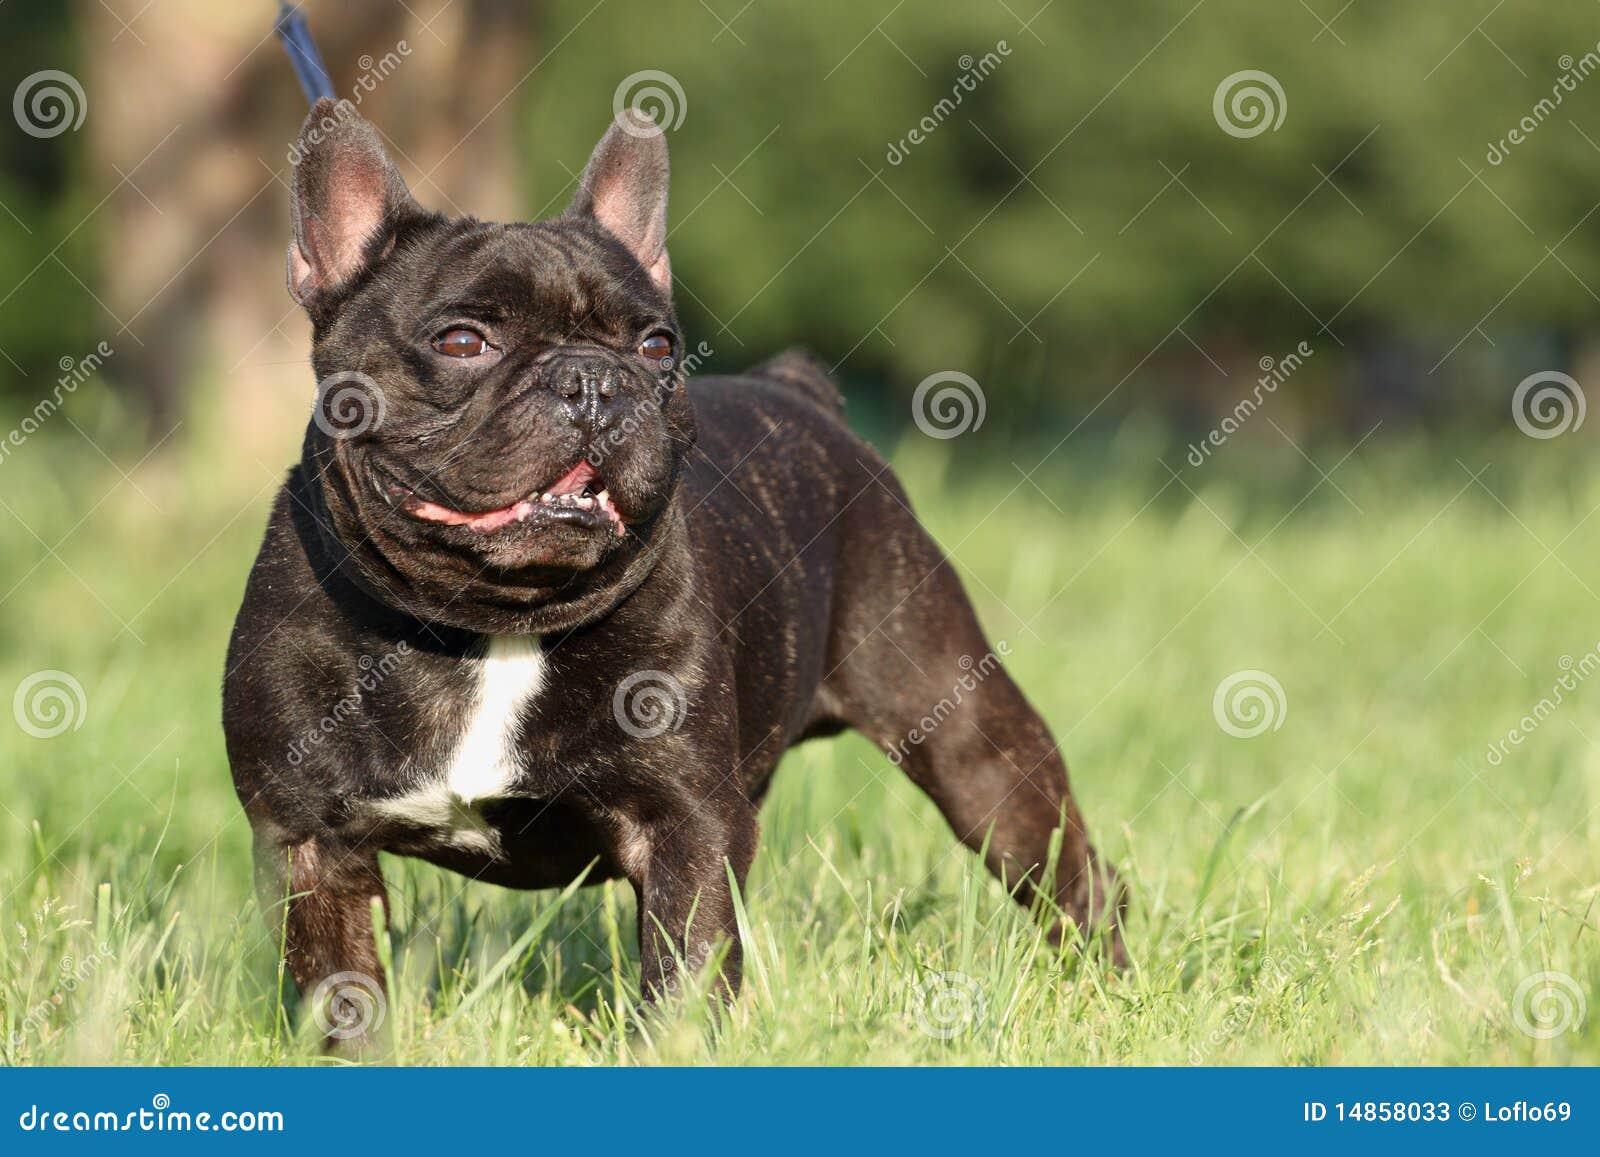 French Bulldog in field